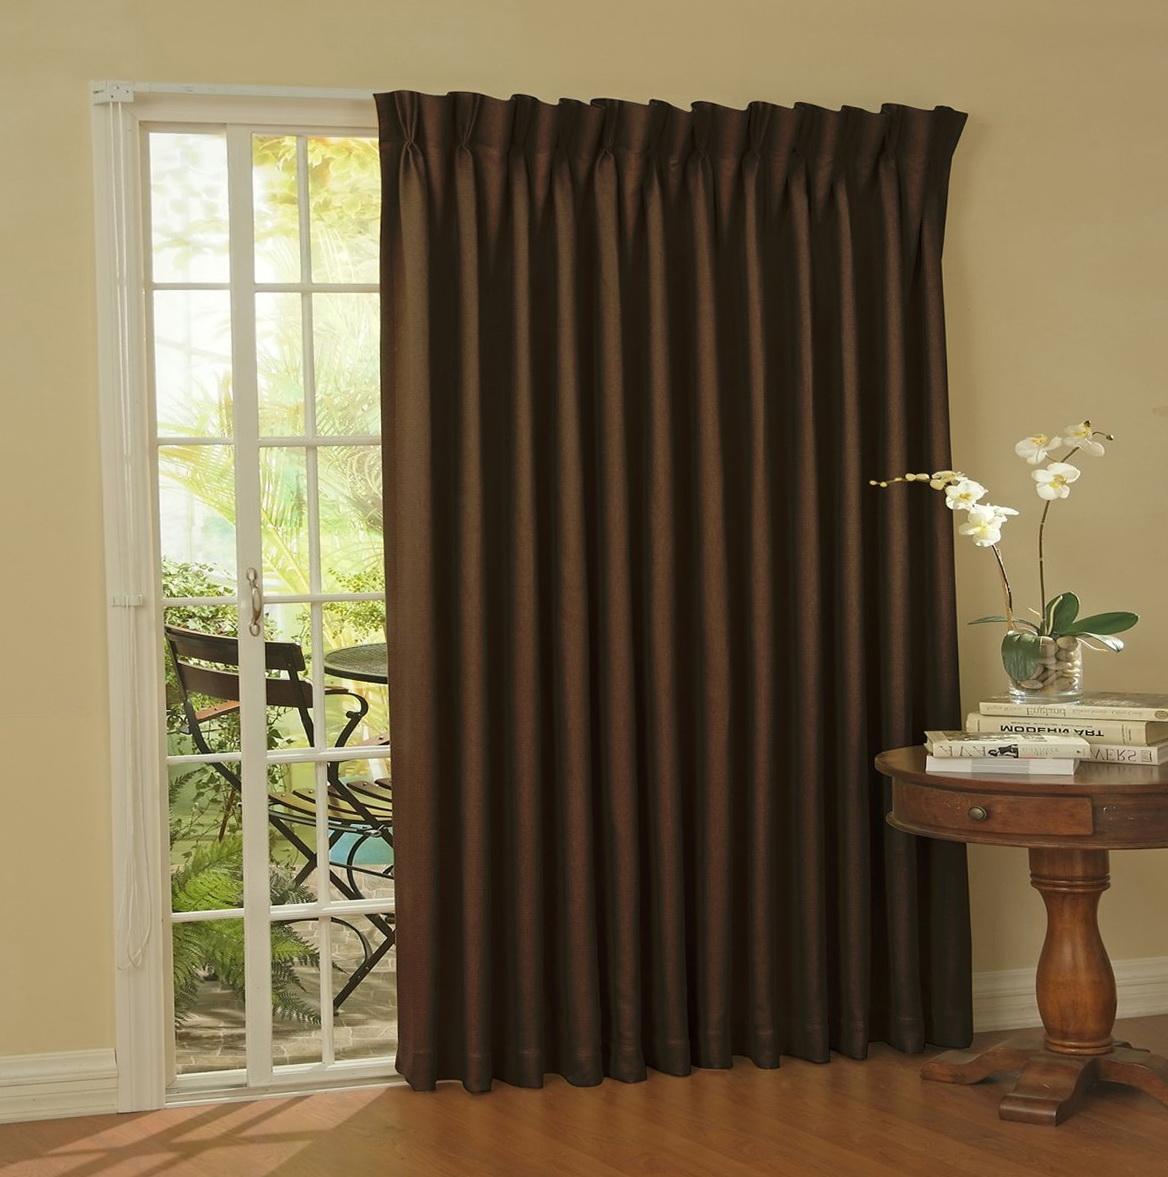 Noise Blocking Curtains Nz